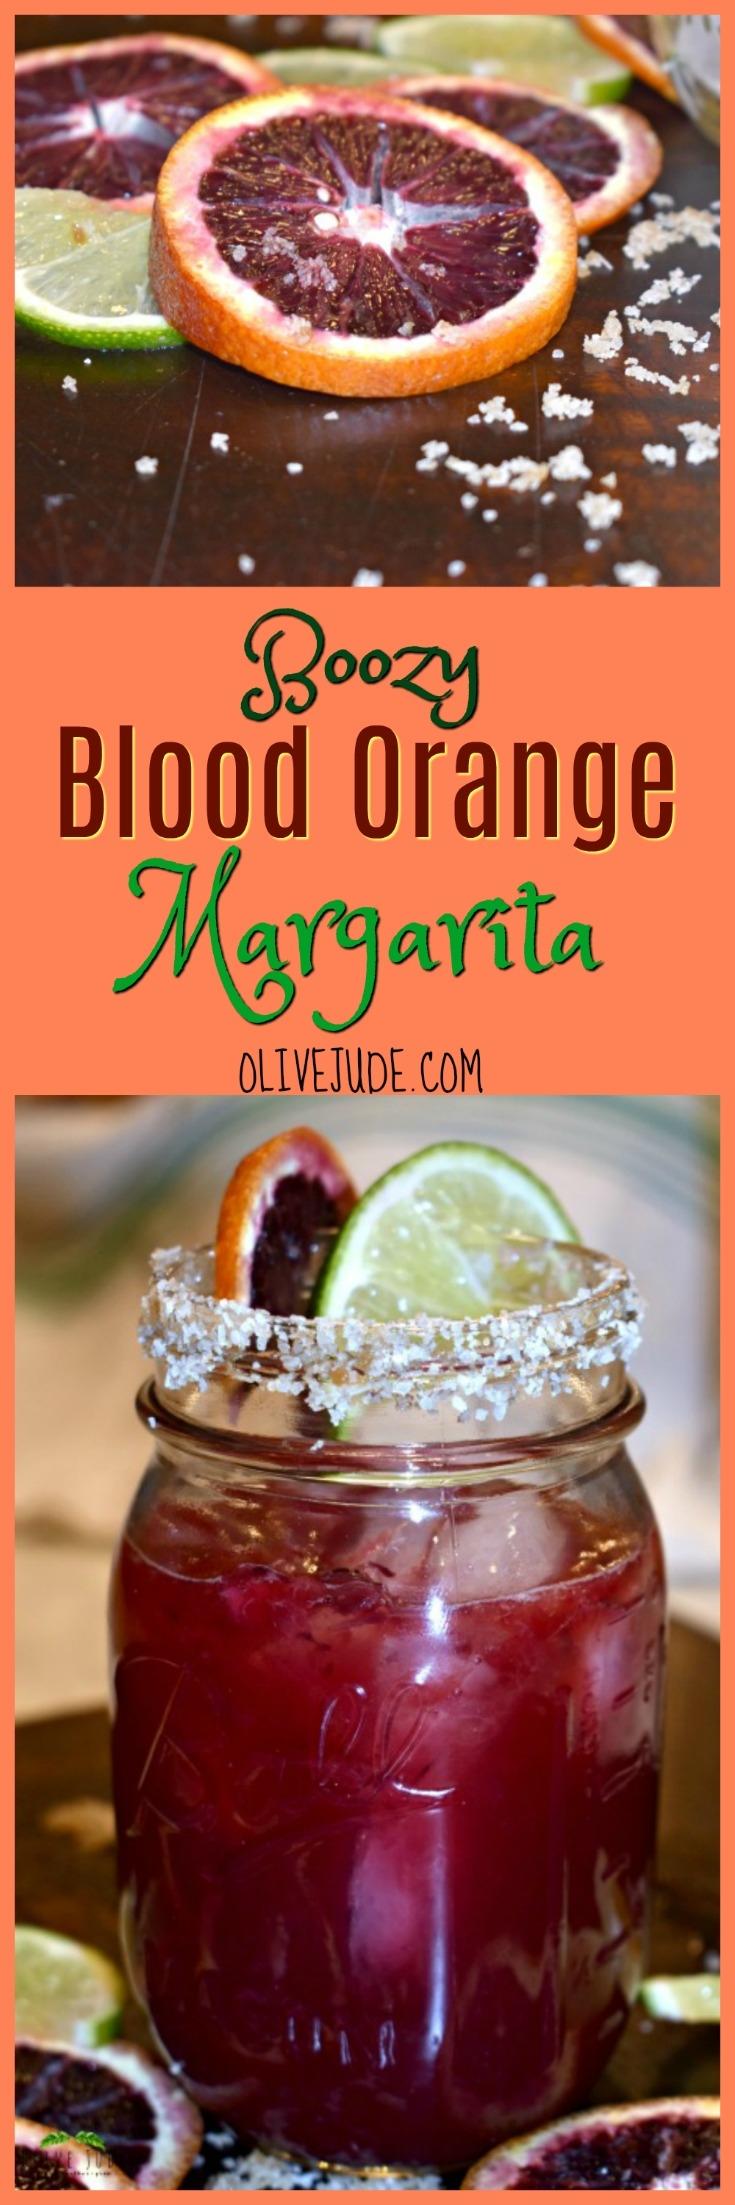 Boozy Blood Orange Margarita